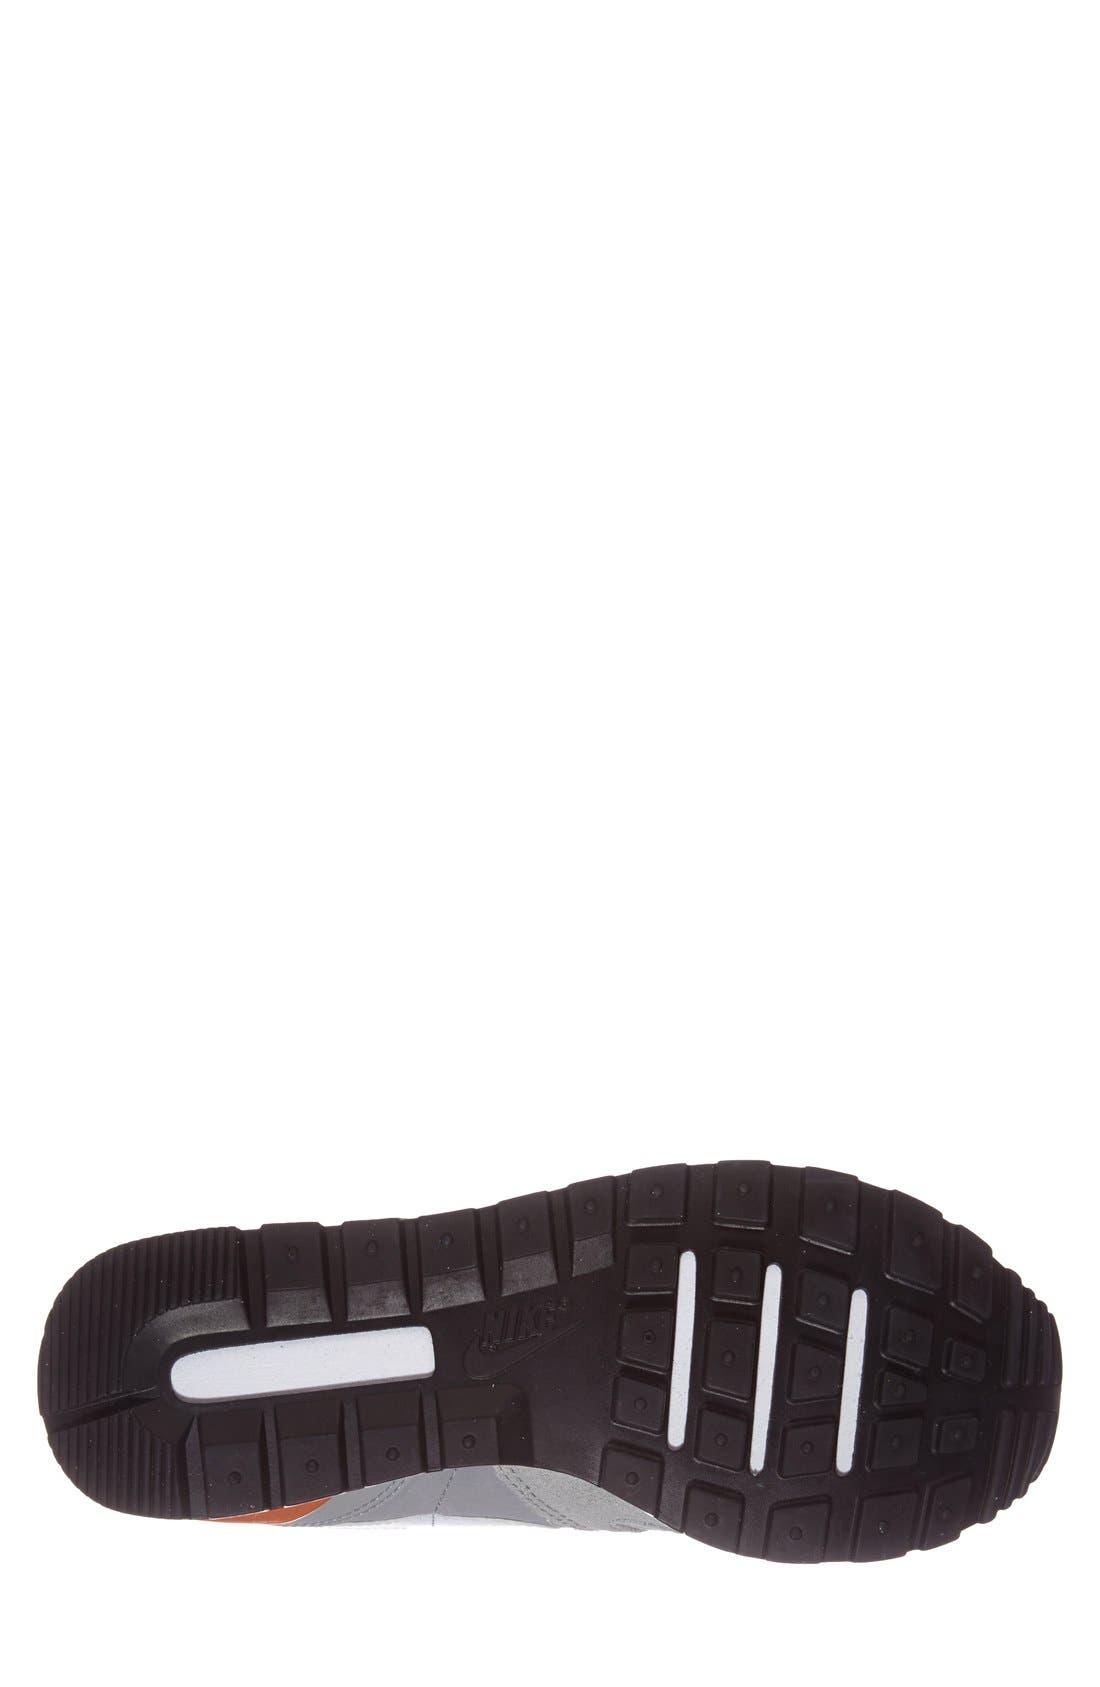 NIKE,                             'Air Waffle Trainer' Sneaker,                             Alternate thumbnail 3, color,                             062